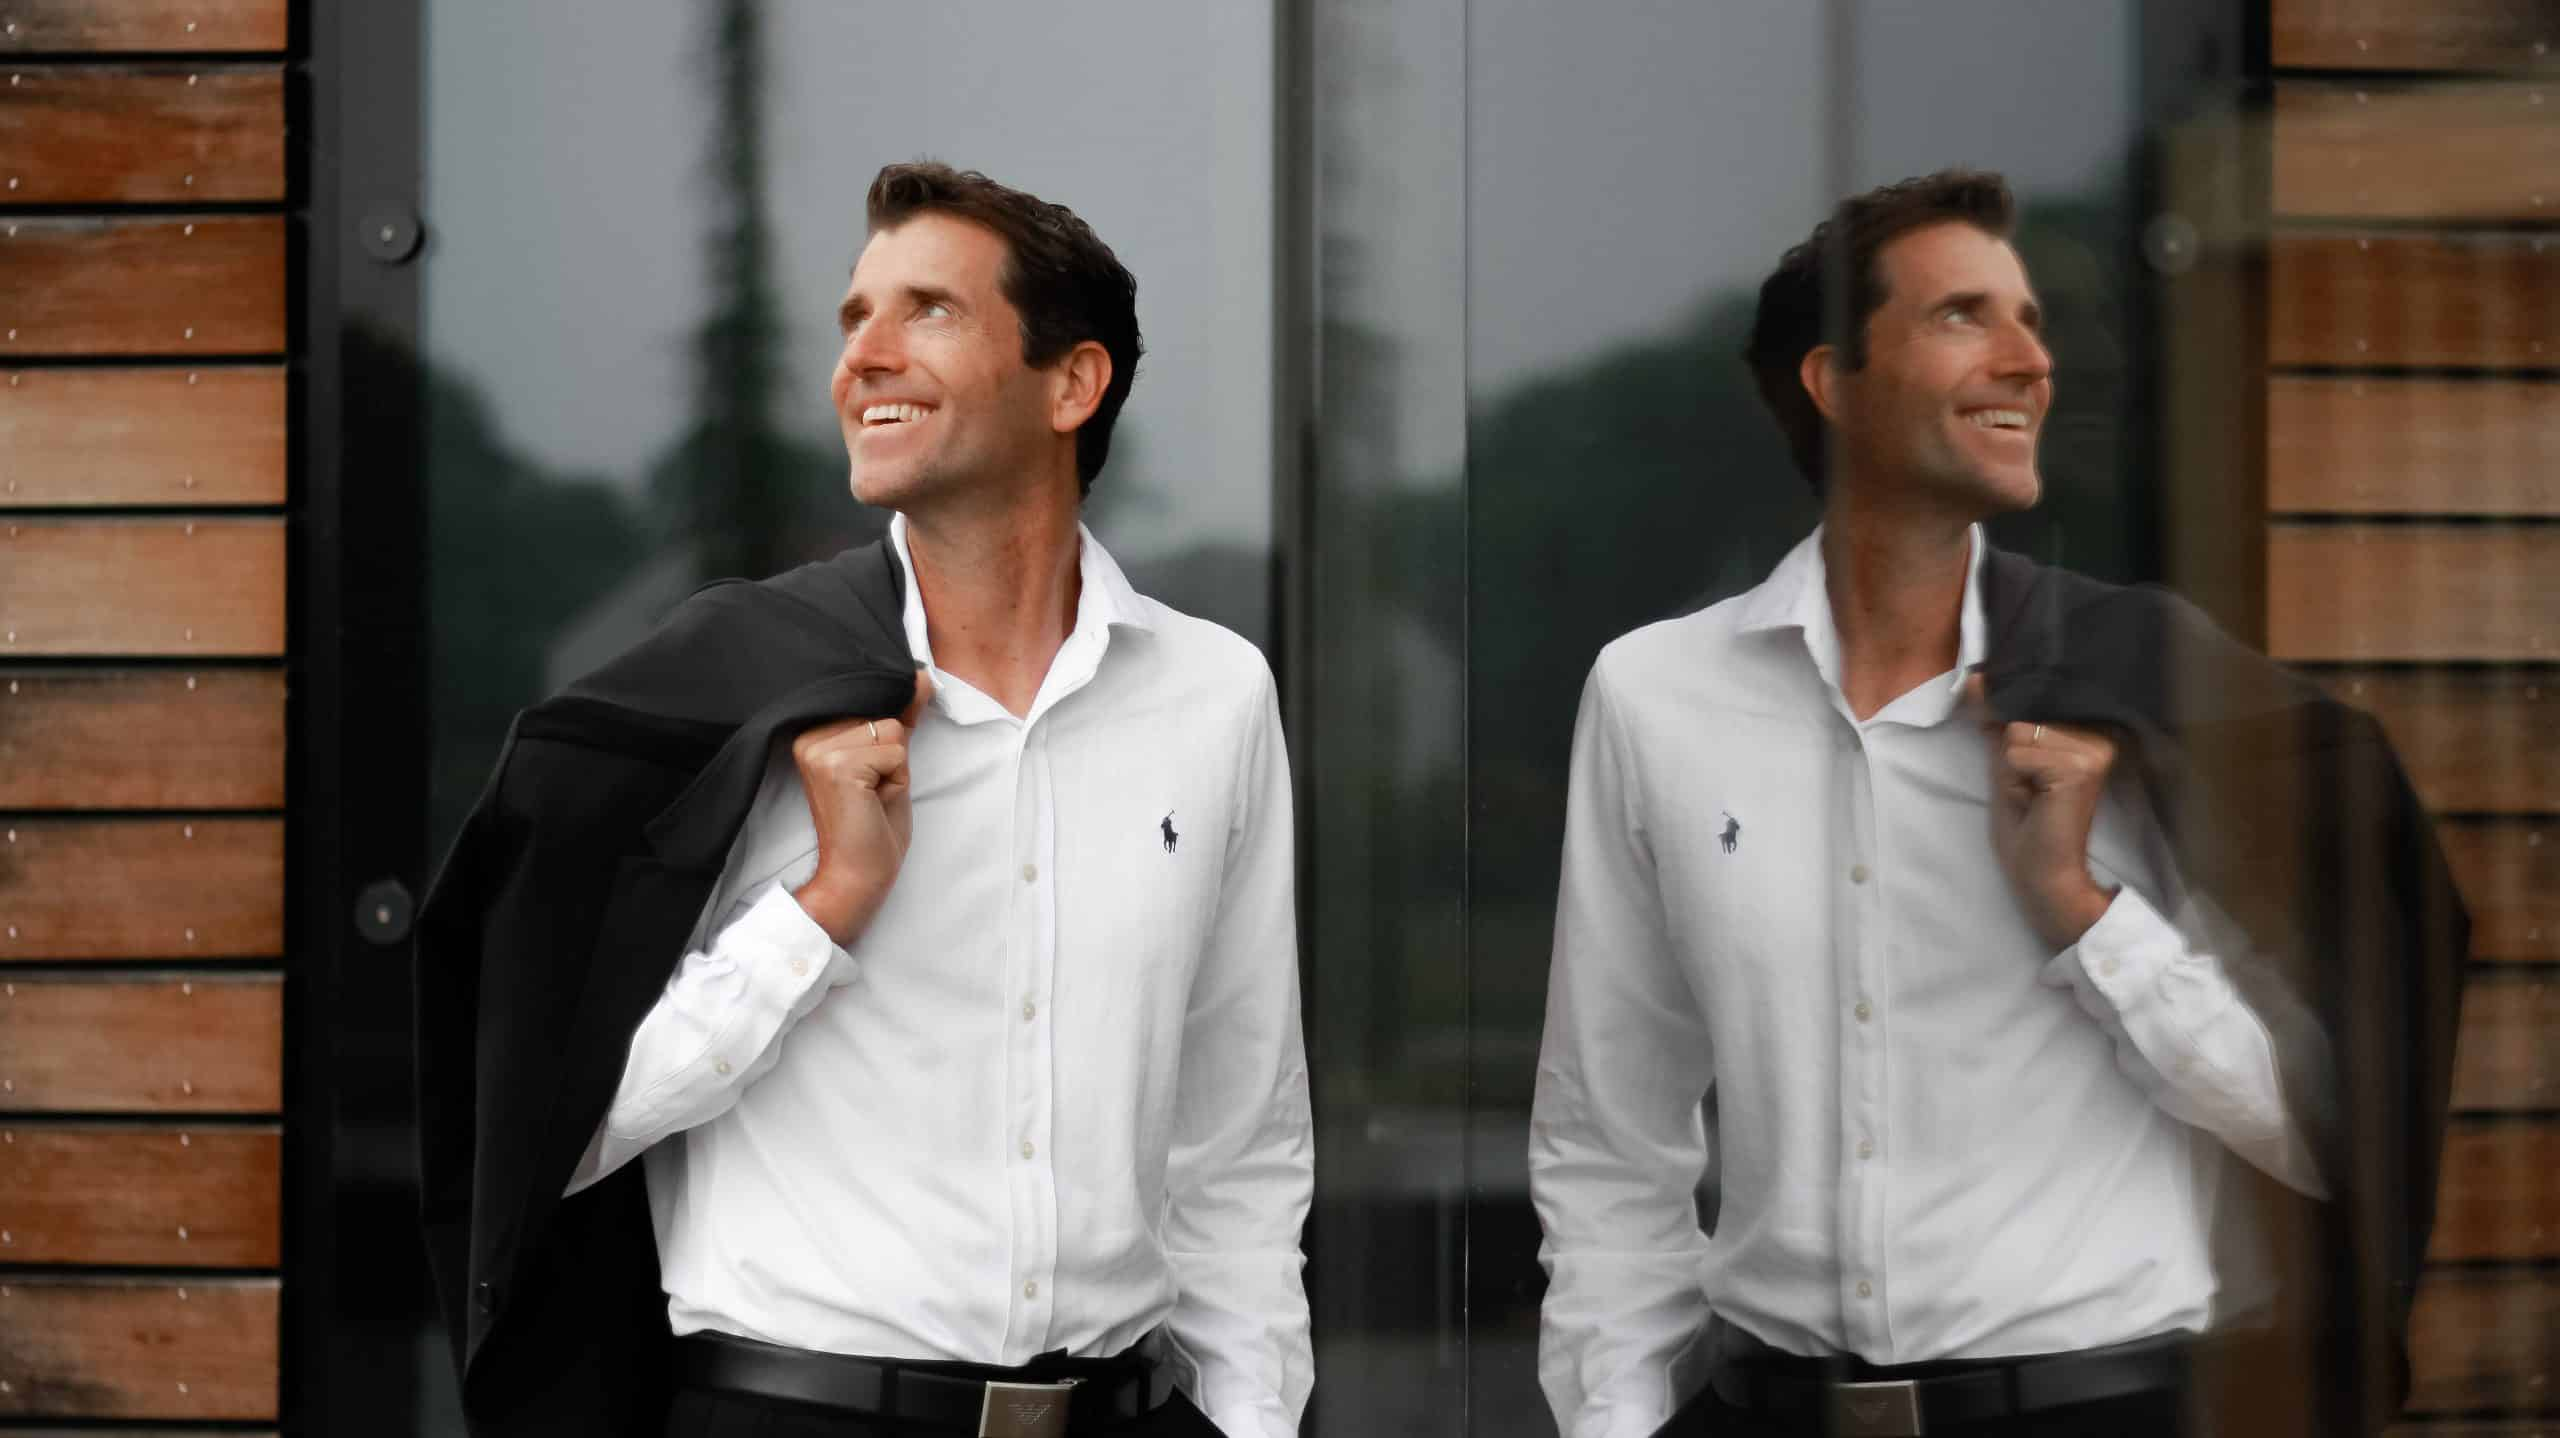 Claus-Stefan Duffner - Digital Transformation Coach